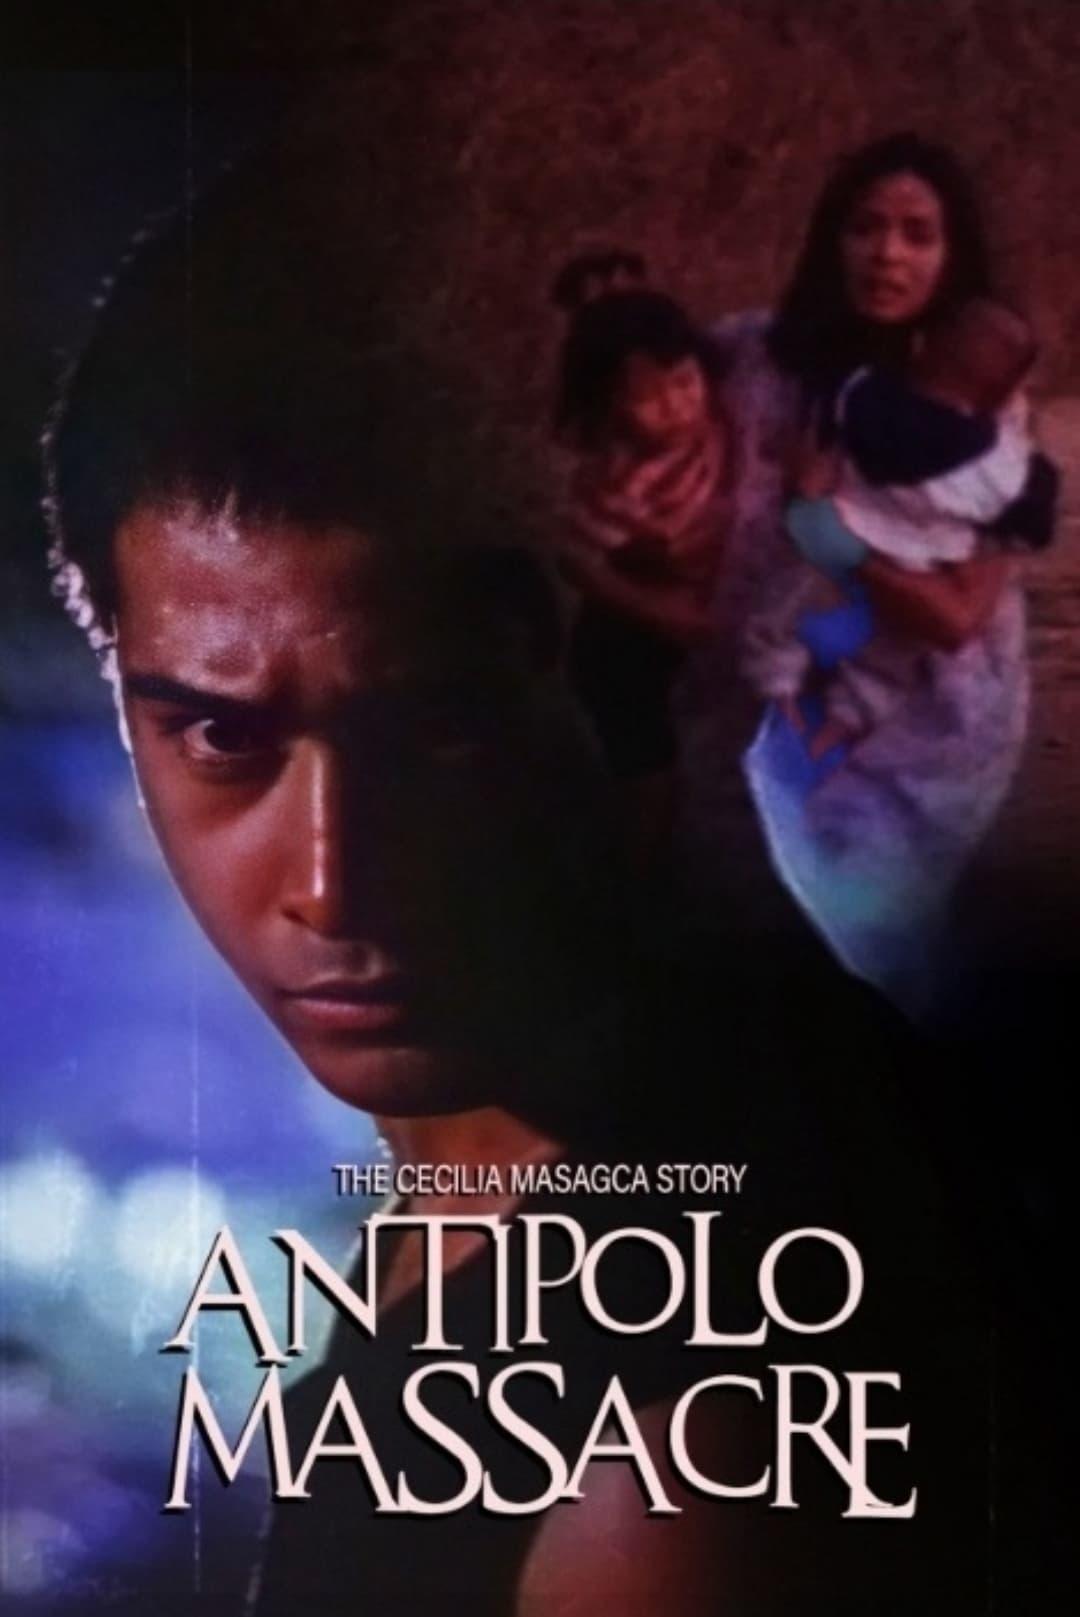 The Cecilia Masagca Story: Antipolo Massacre (Jesus Save Us!)